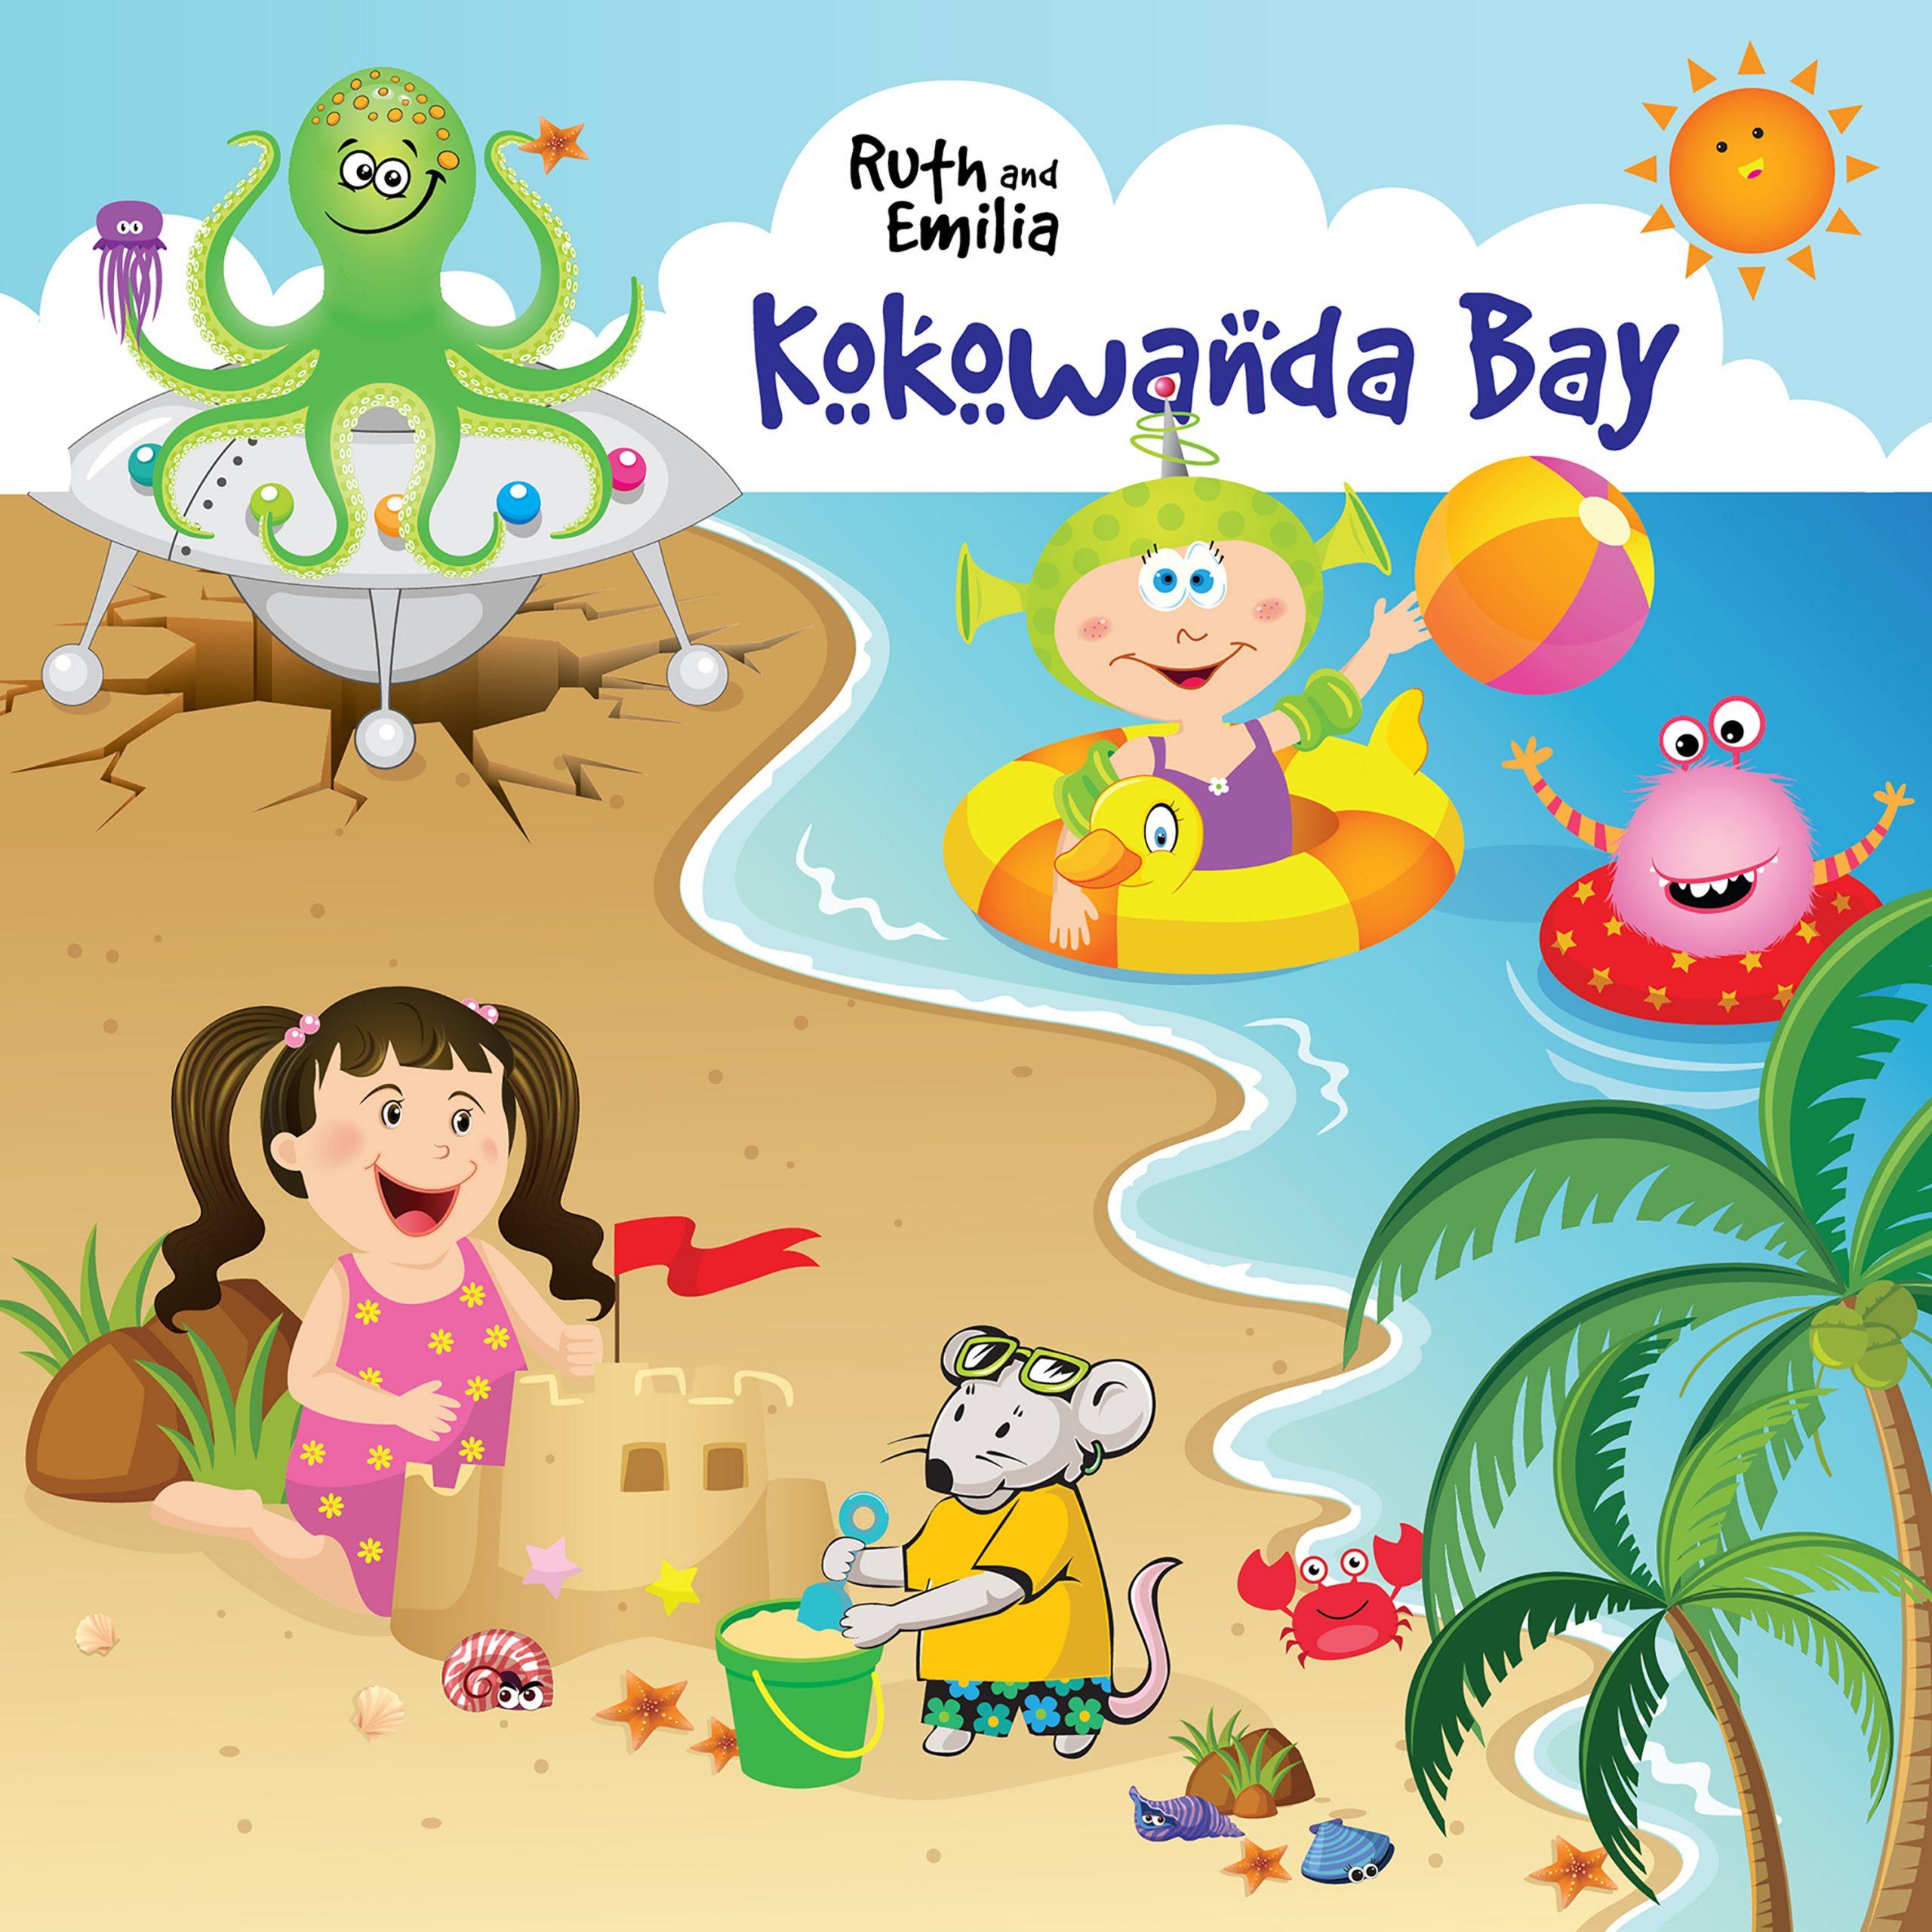 Kokowanda Bay by Ruth and Emilia